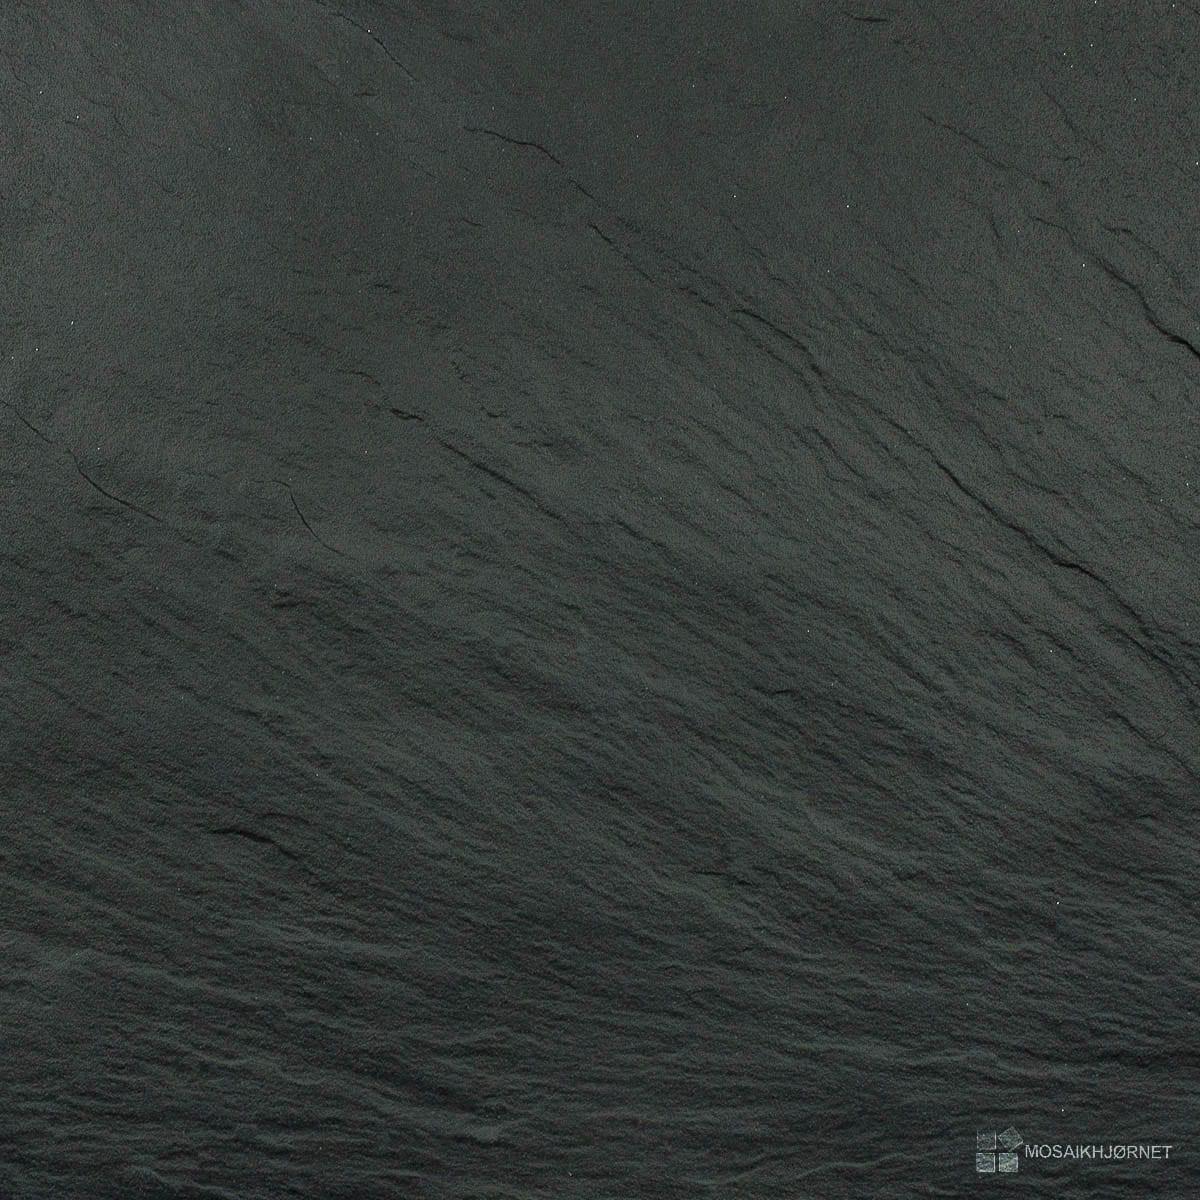 #515B5B Mest effektive Black Ardesia PS 60x60 Mosaikhjørnet Fliser Klinker Og Mosaik Til Badevæ  Fliser Til Bad Og Køkken 4805 120012004805